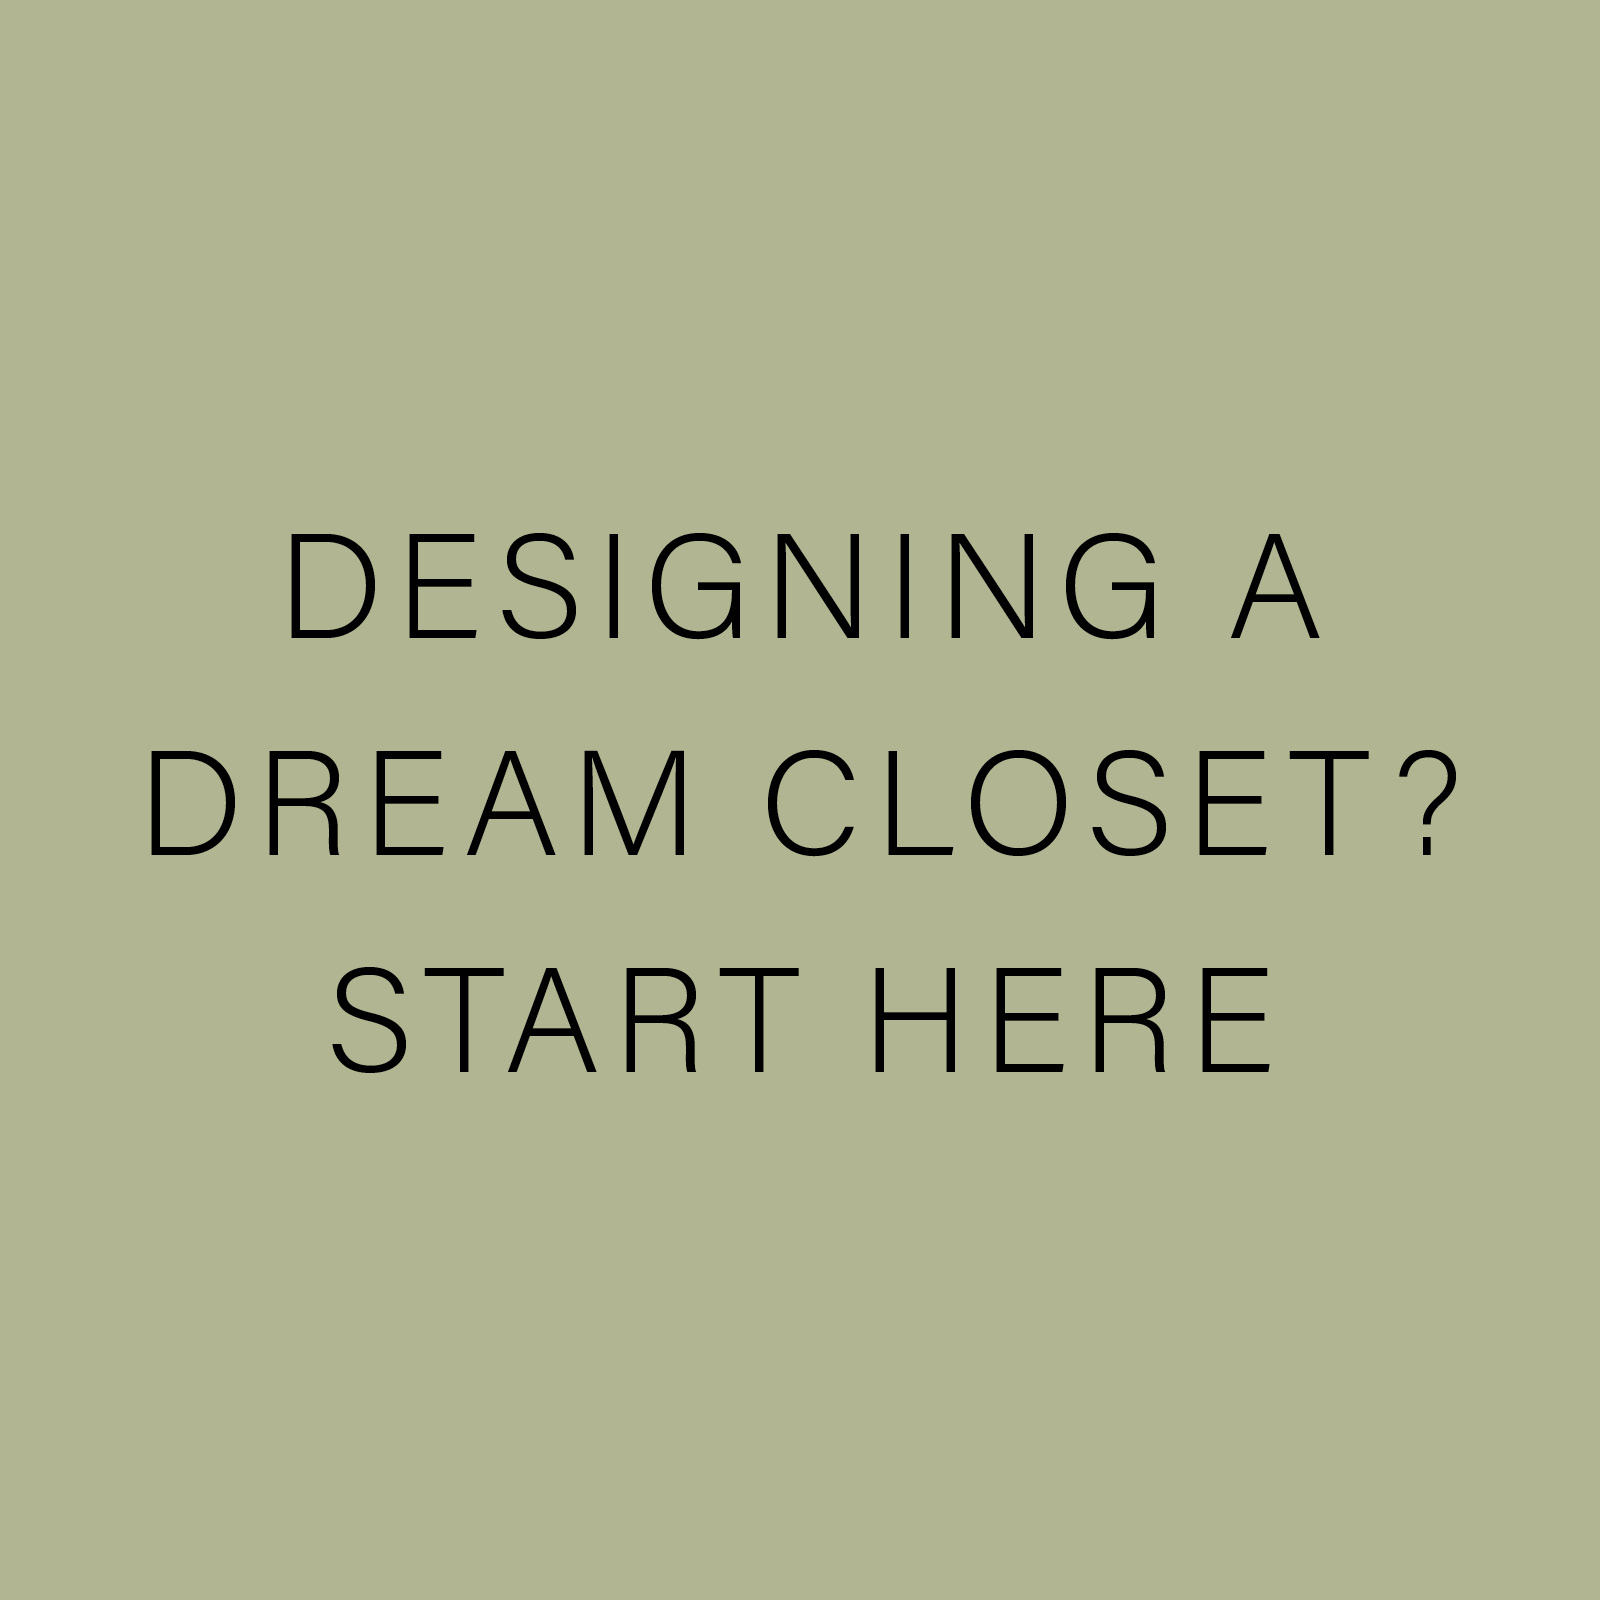 DESIGNING A DREAM CLOSET? START HERE.jpg